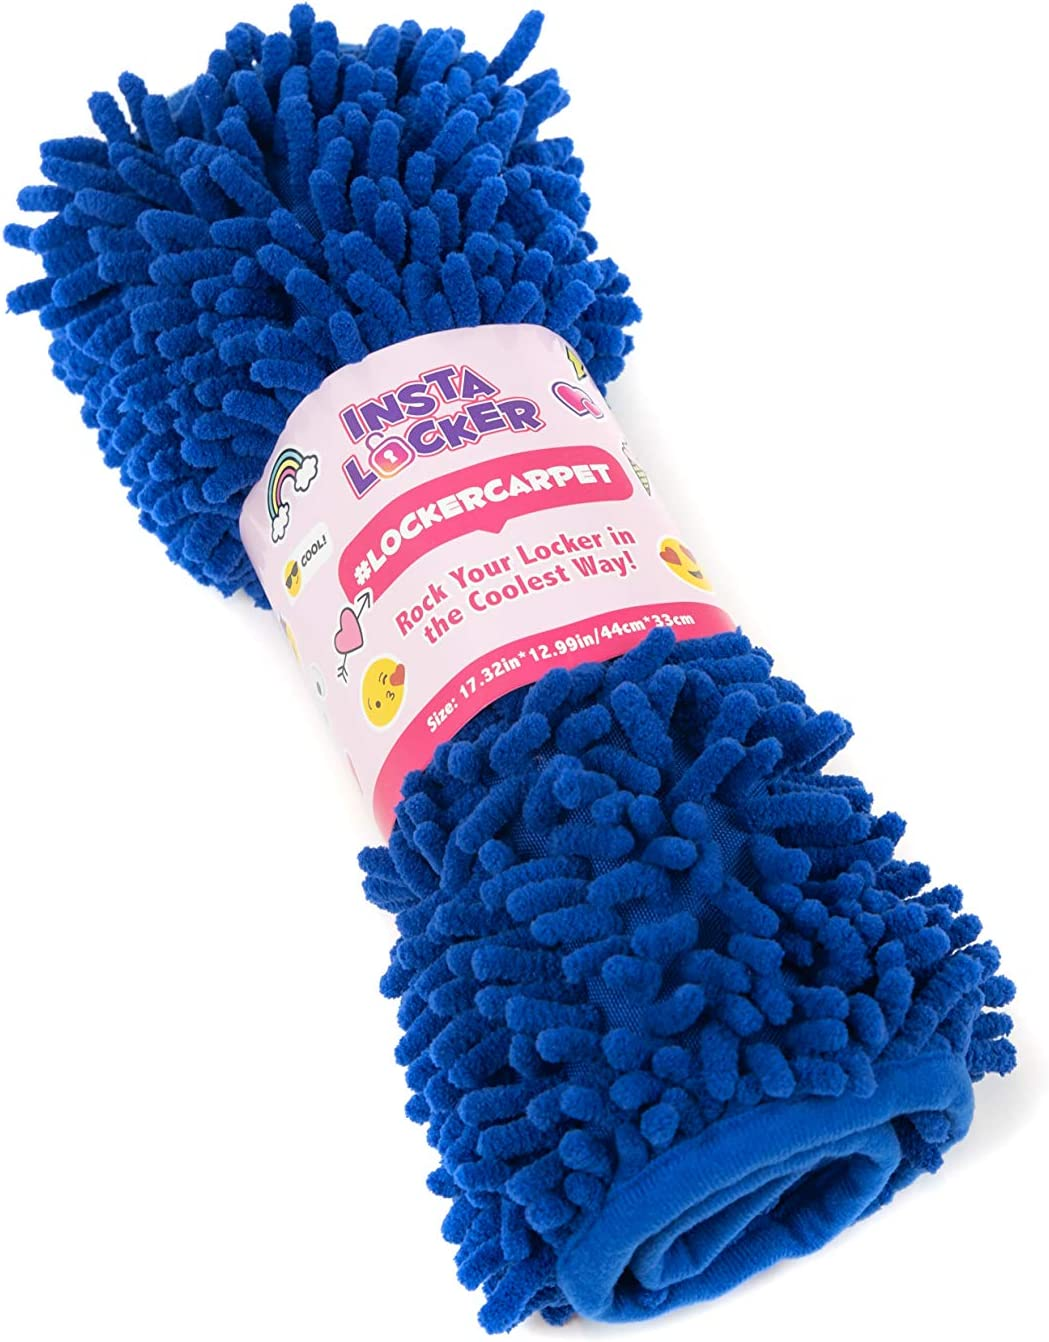 InstaLocker School Locker Decorations Carpet - Locker Rugs for Girls - 100% Microfiber, Shaggy Style Locker Rugs - 11.5